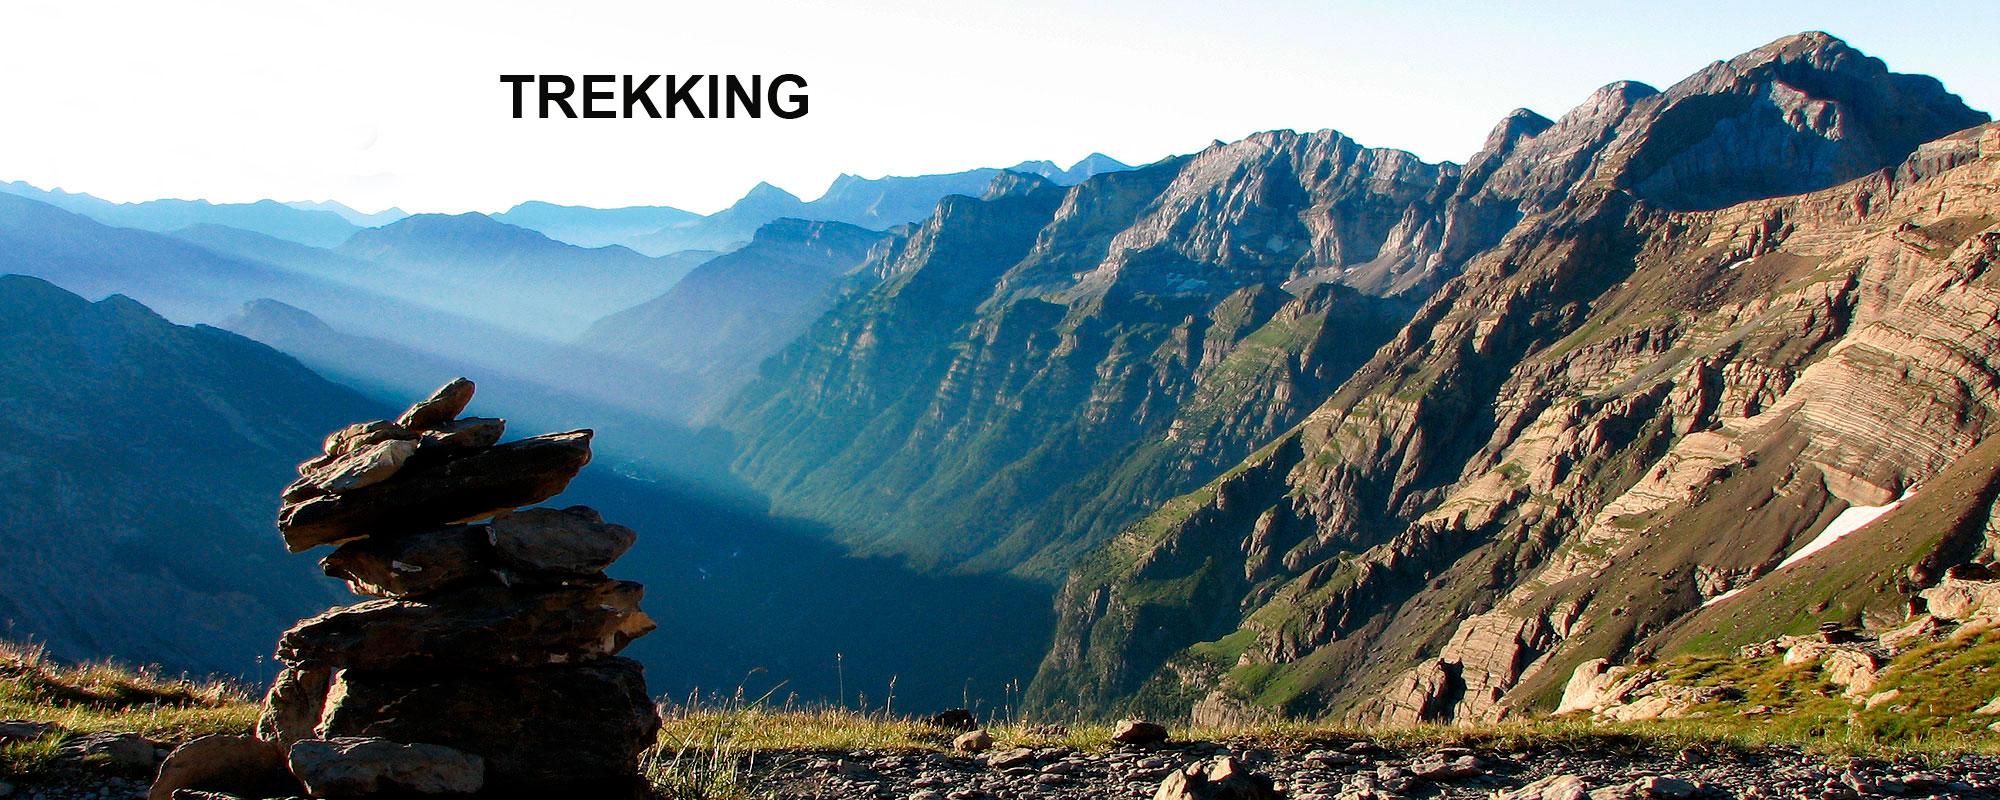 trekking-monte-perdido-extrem